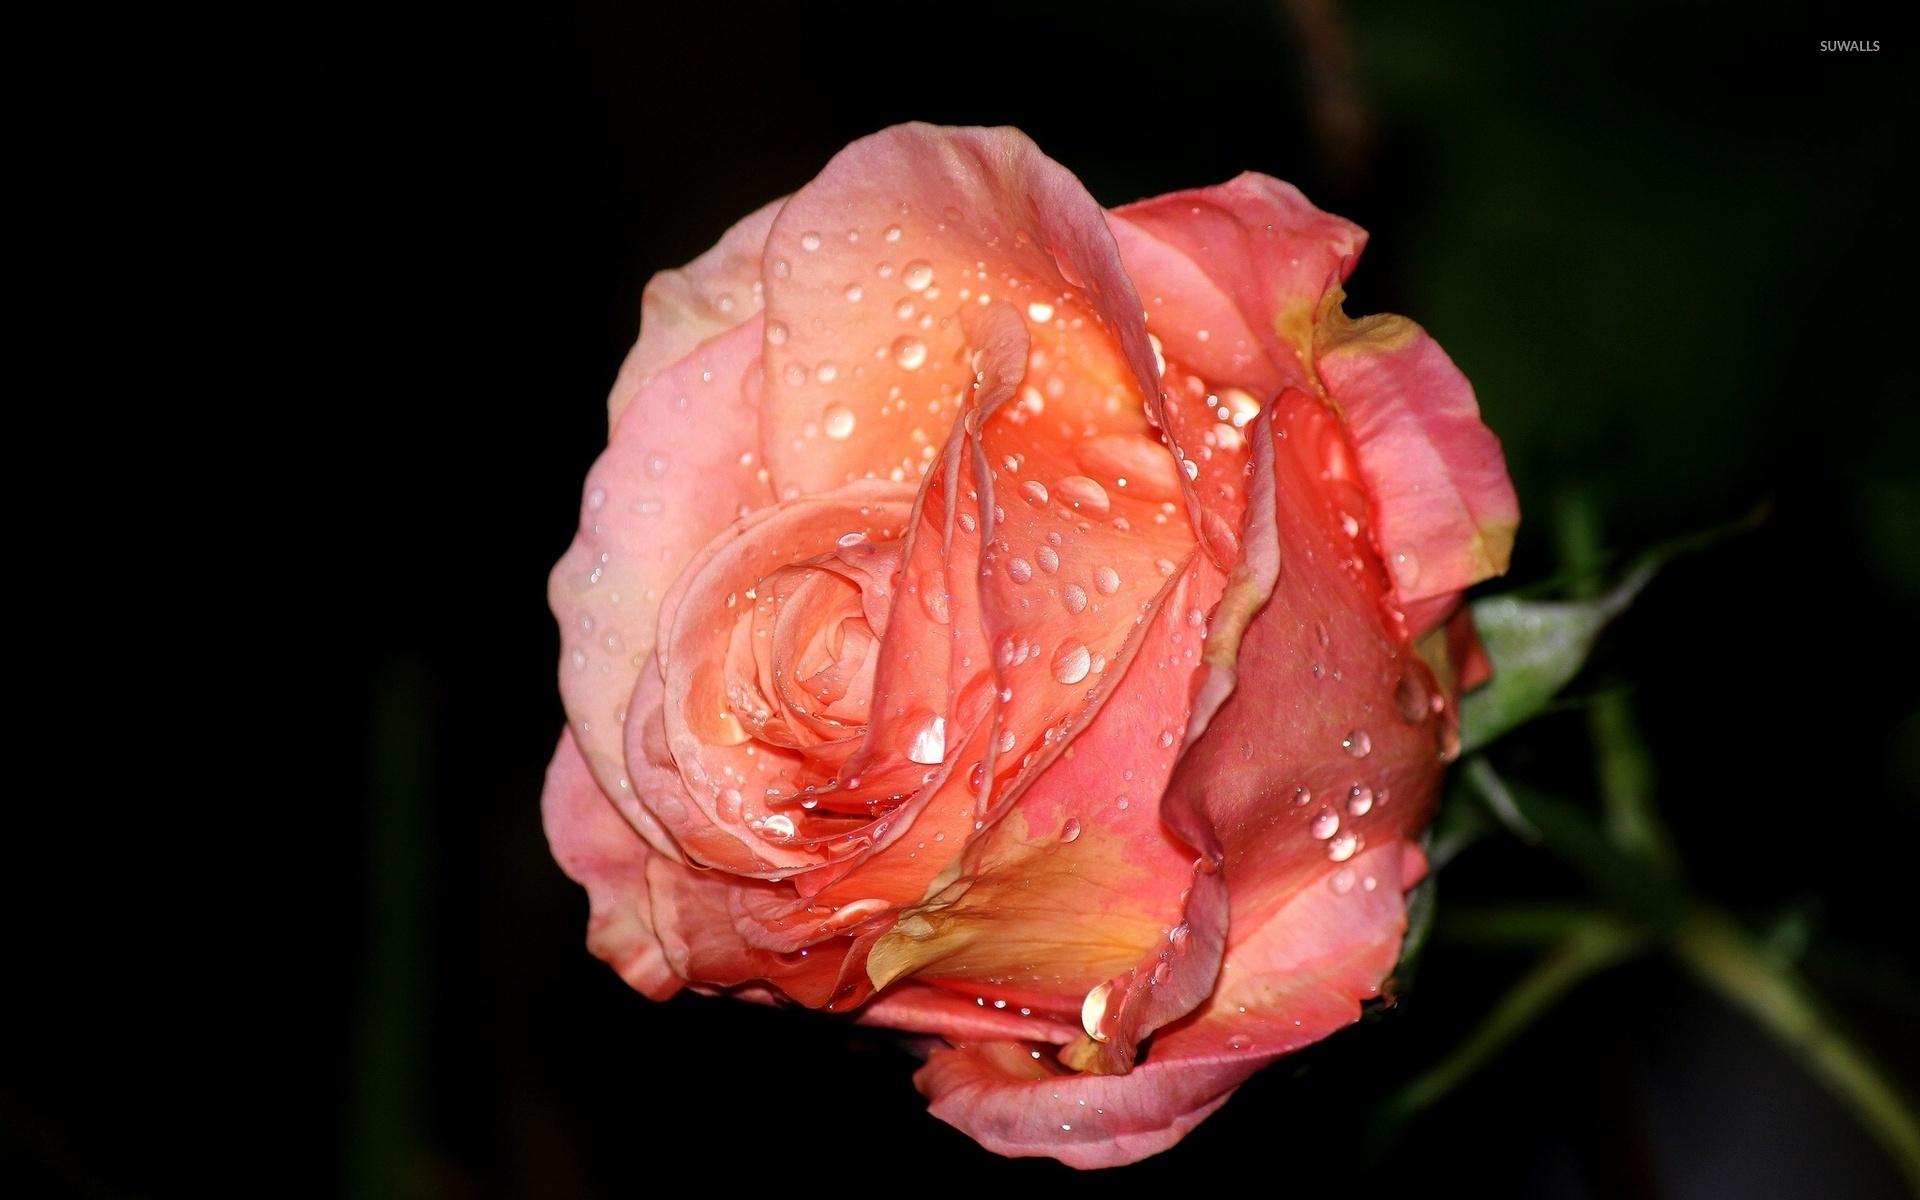 Роза с капельками  № 1352937 без смс